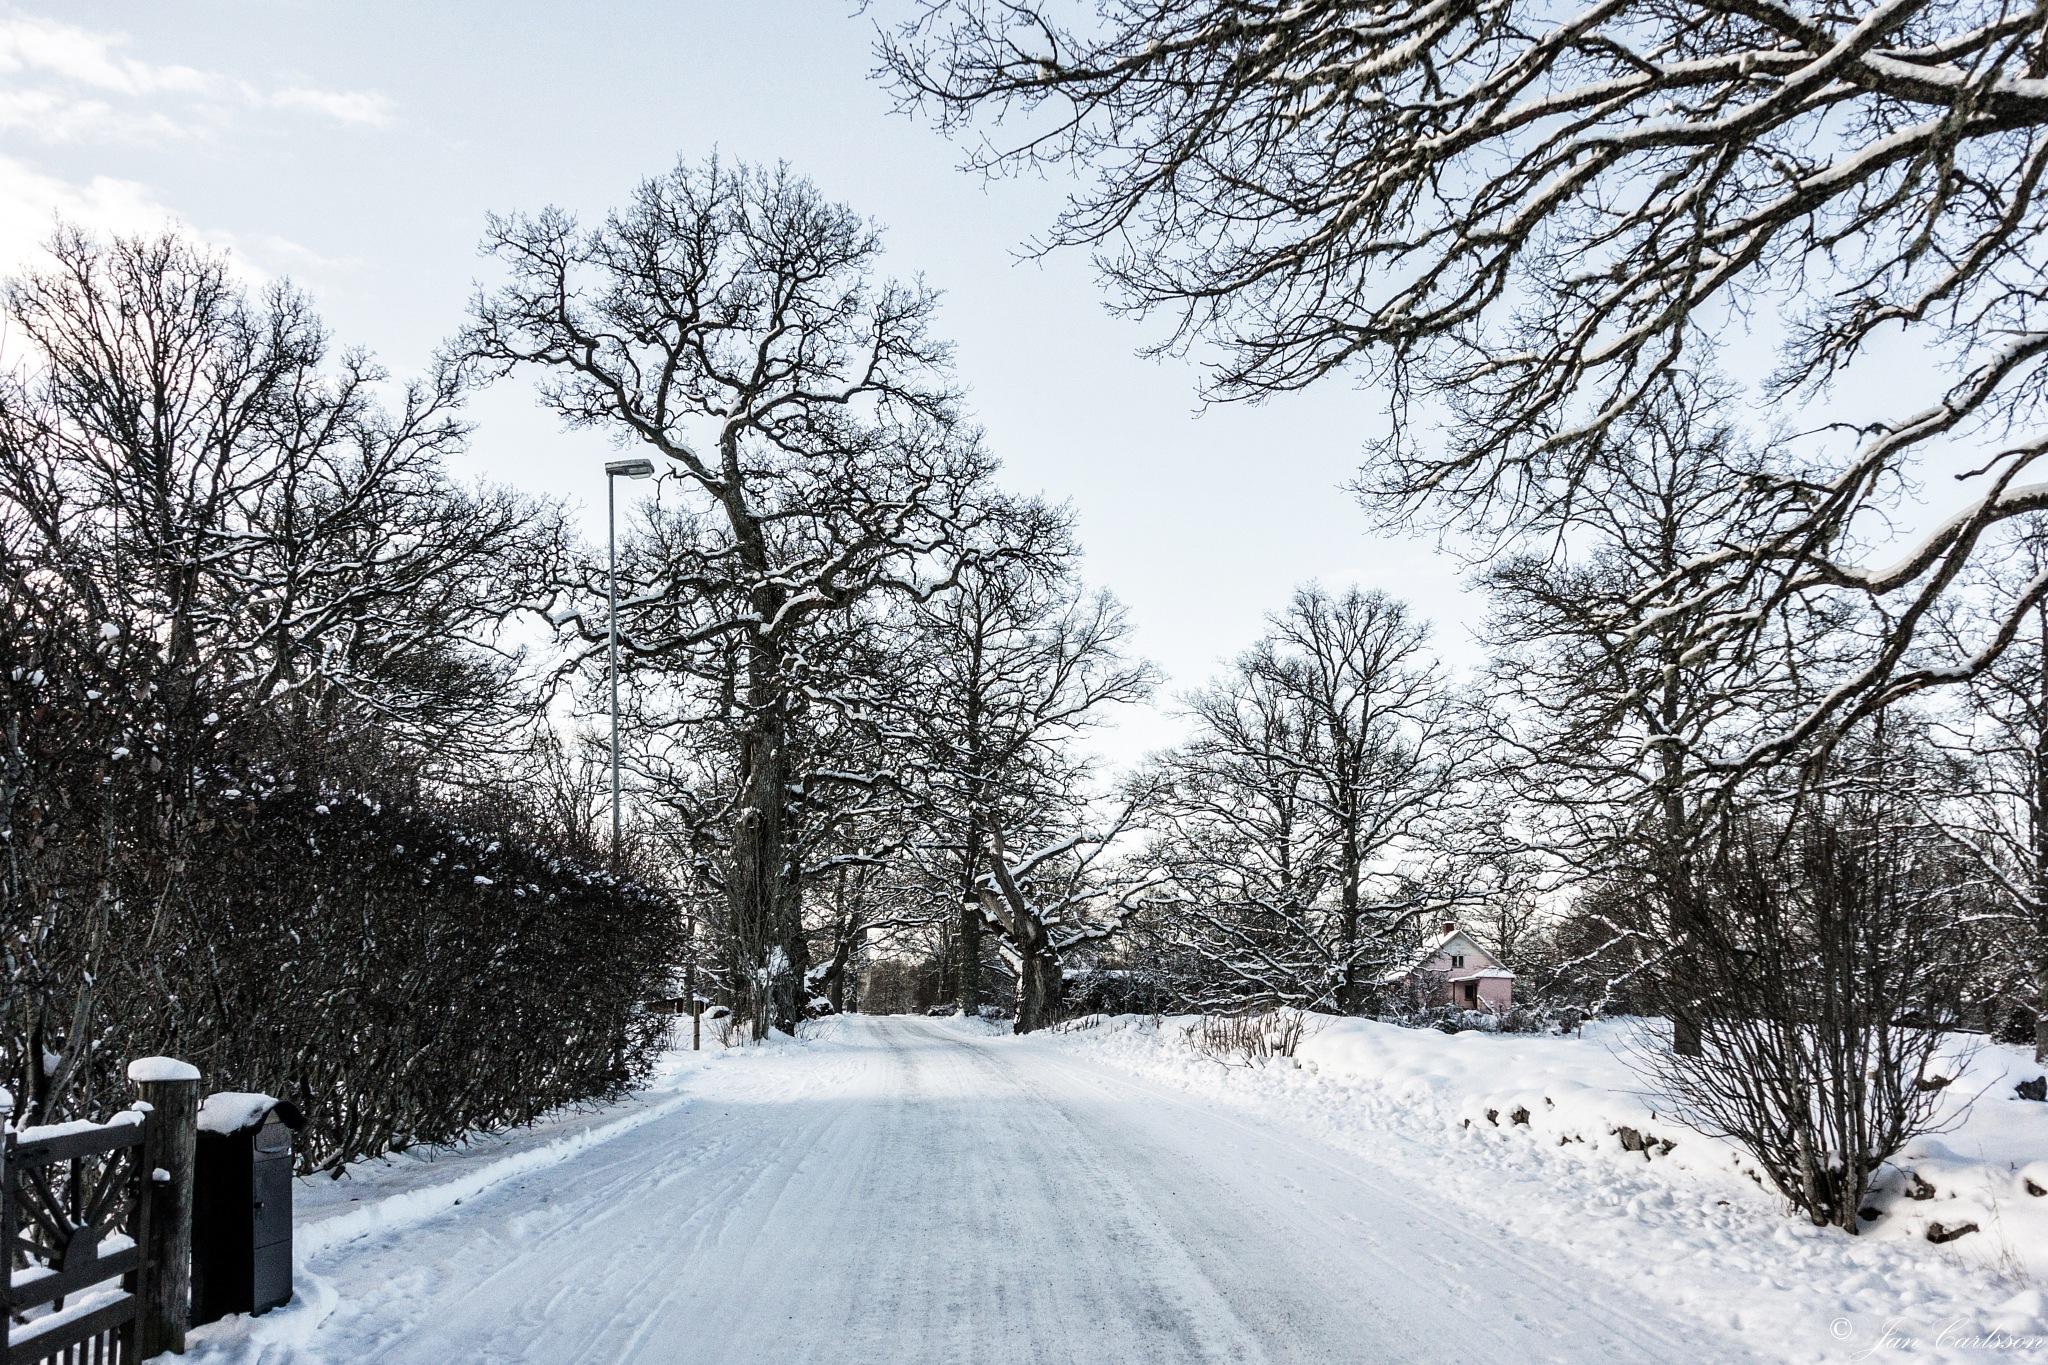 A Very Cold February Morning by carljan w carlsson